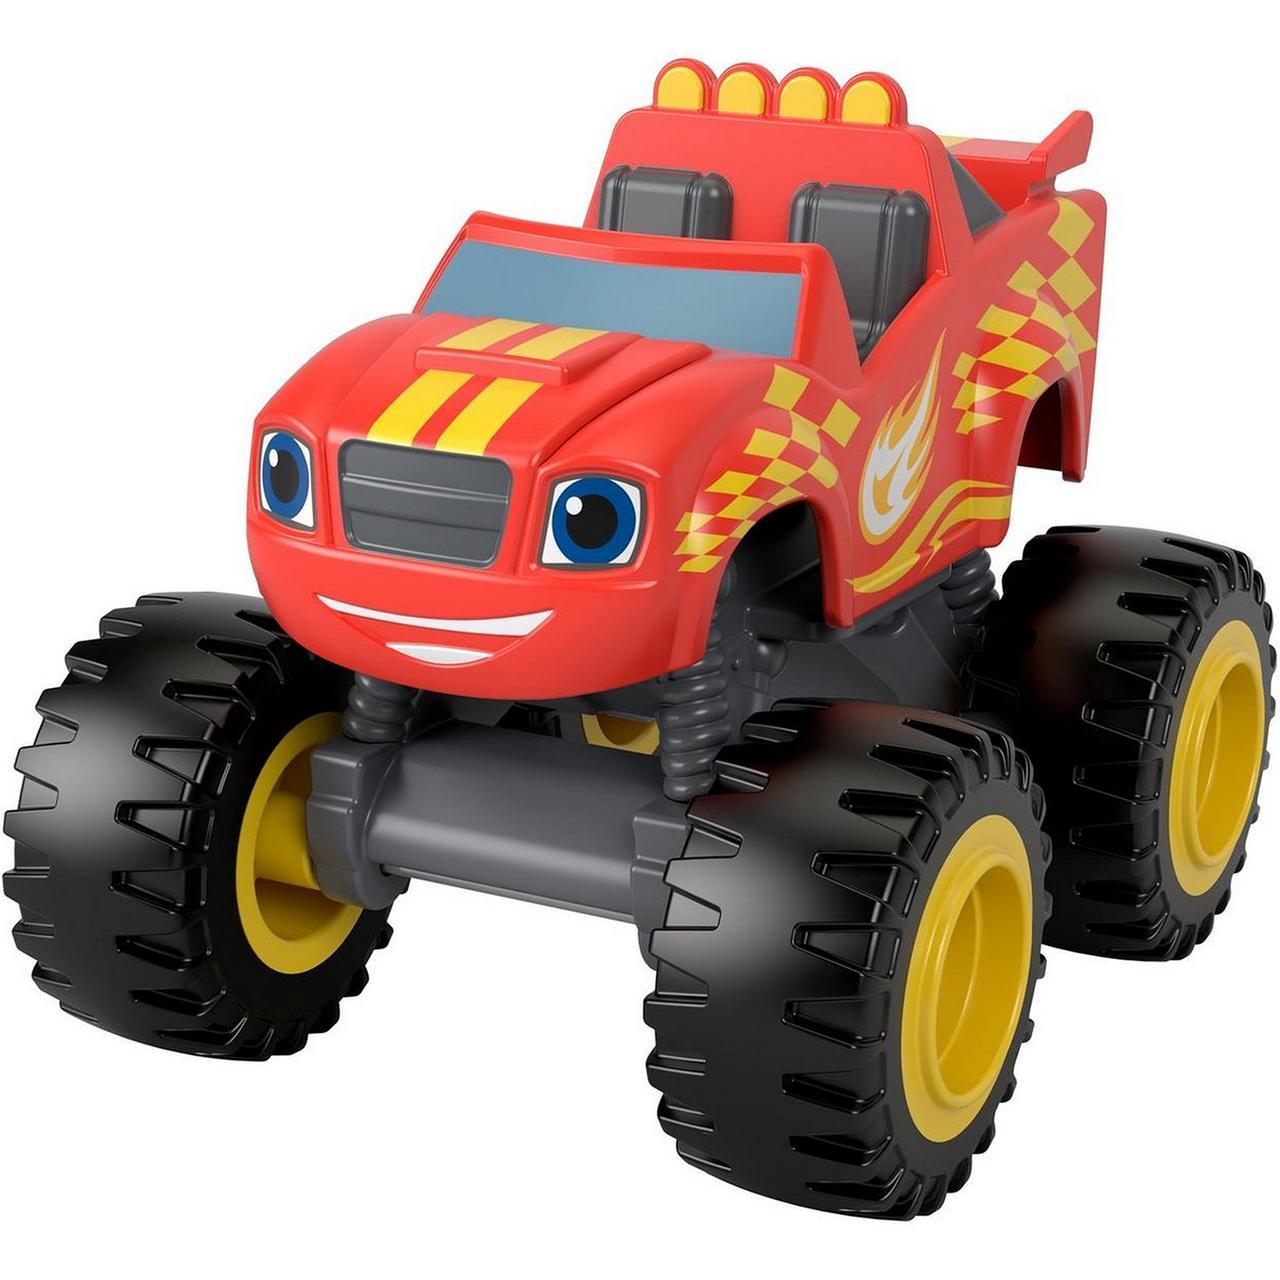 Машинка Вспиш і диво машинки Гоночний прапор Fisher-Price Blaze & the Monster Machines Blaze GVG61